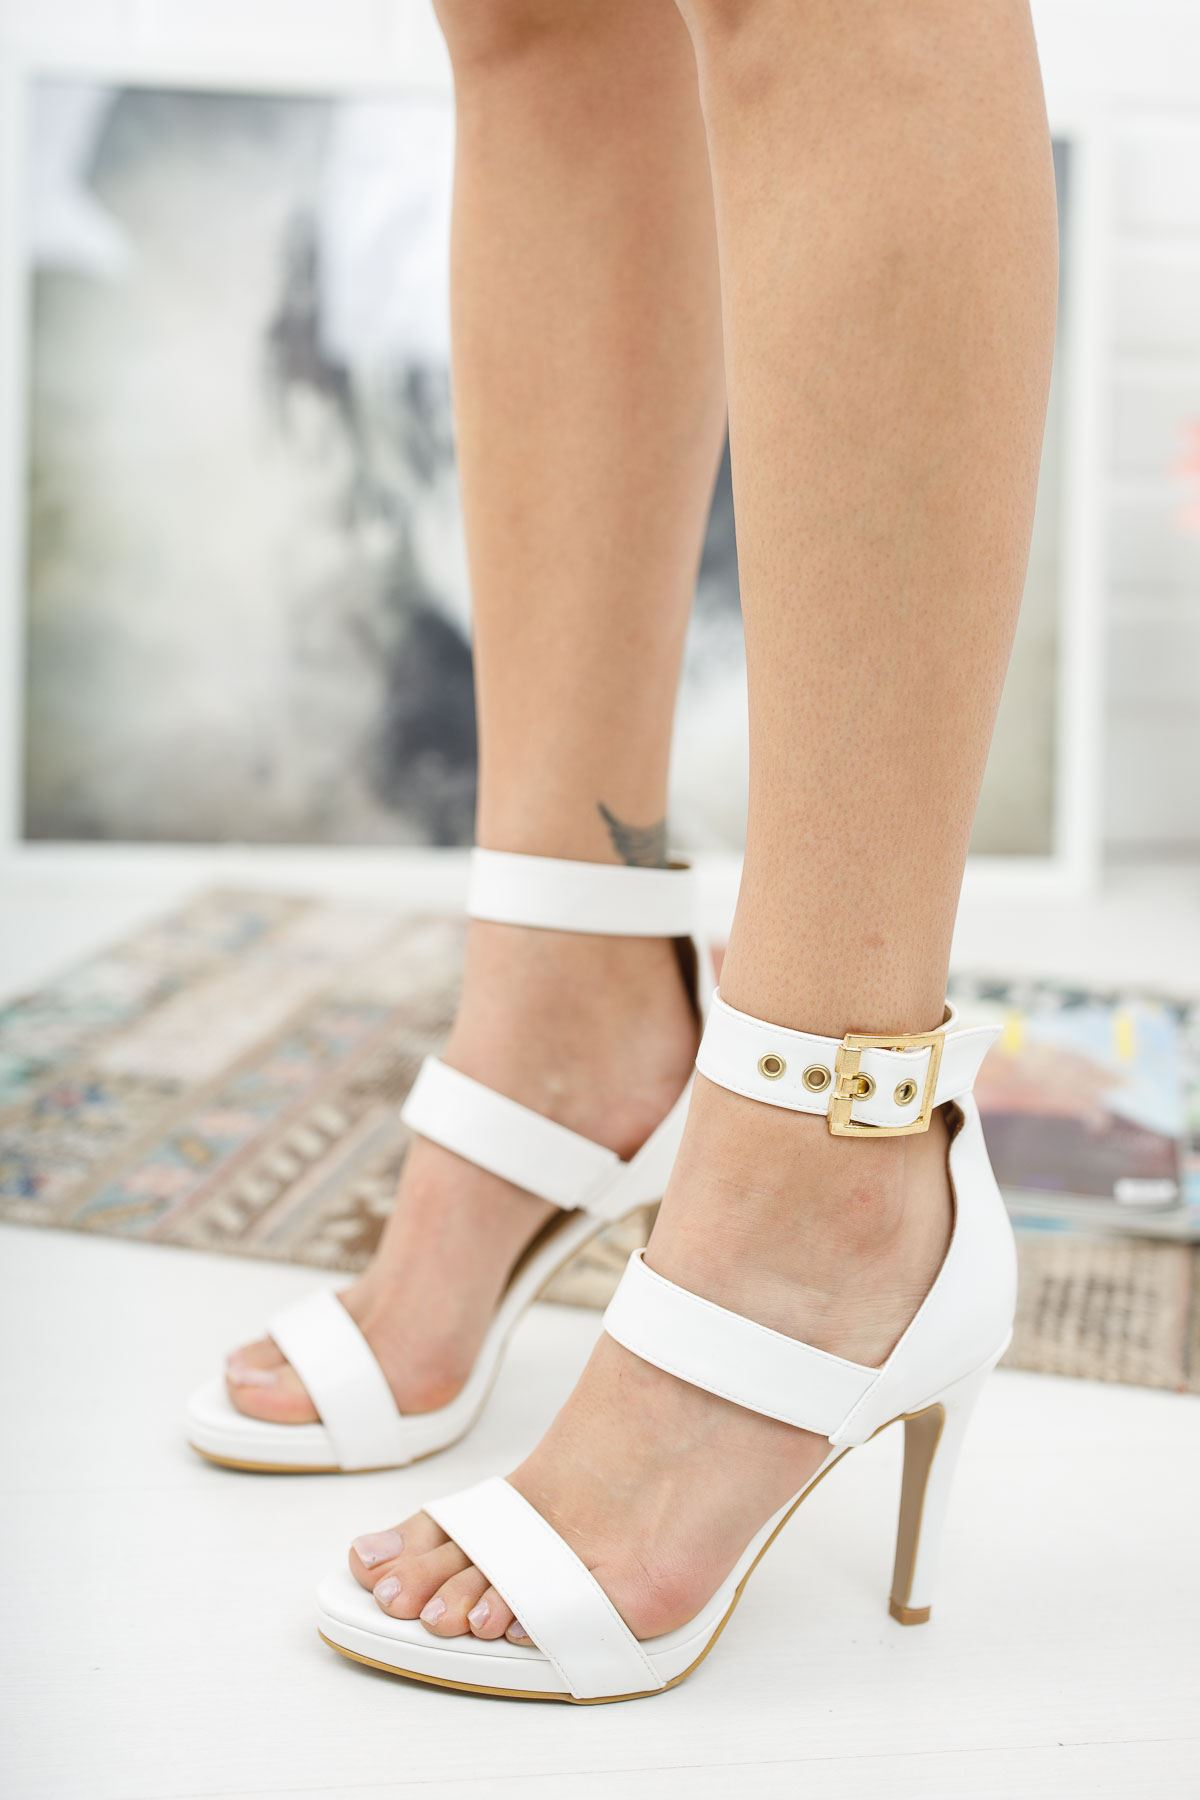 Giorgia Beyaz Cilt Topuklu Ayakkabı